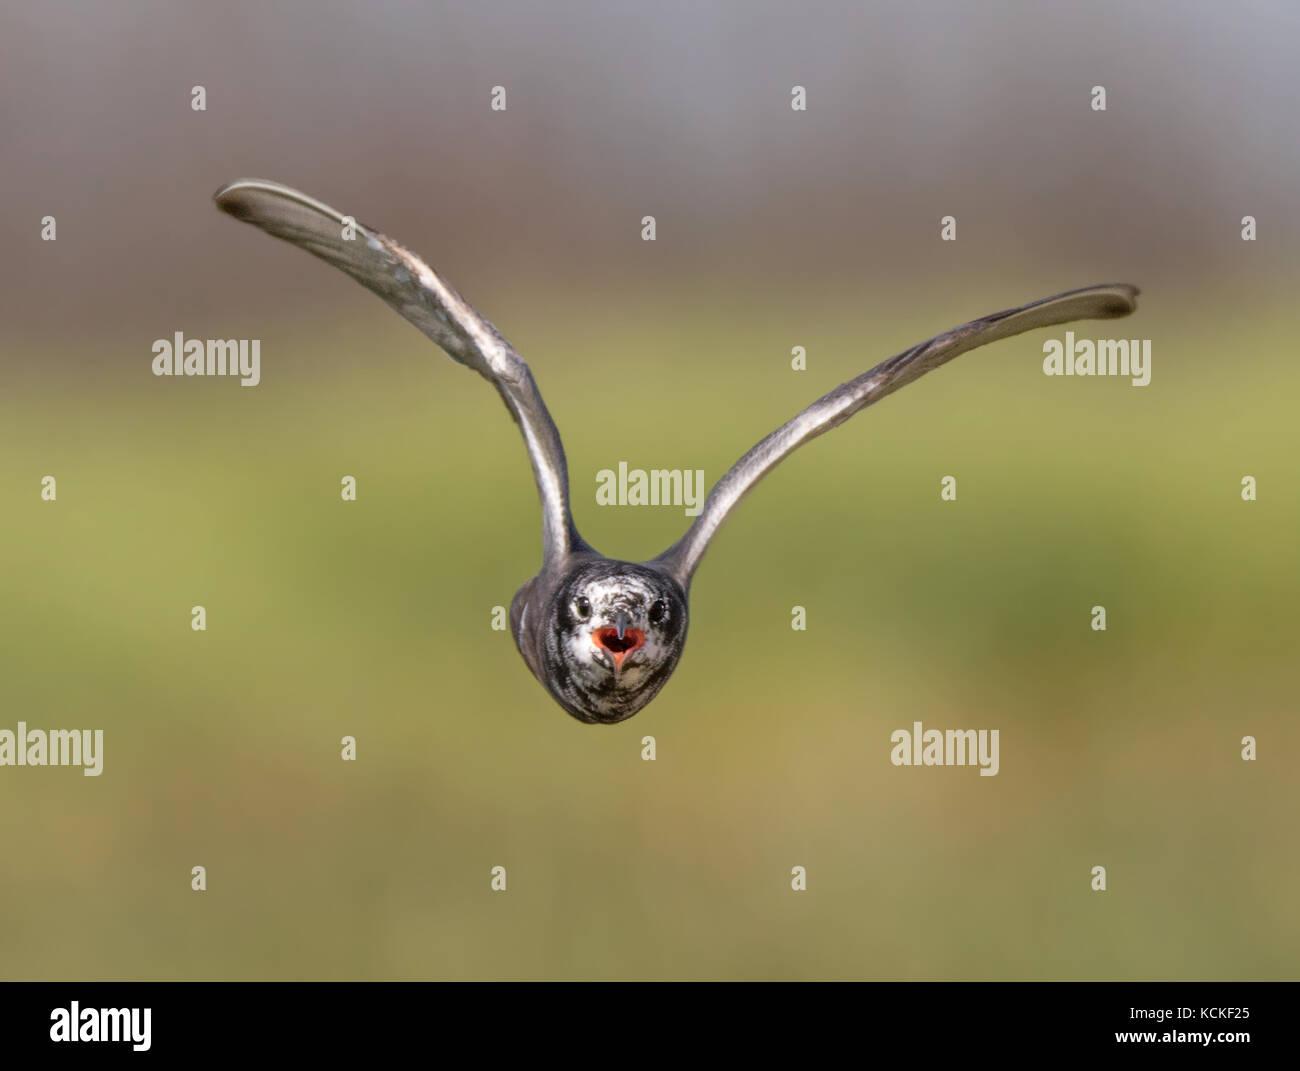 A Black Tern, Chlidonias niger, agressively dive bombs the photographer, near Saskatoon, Canada - Stock Image